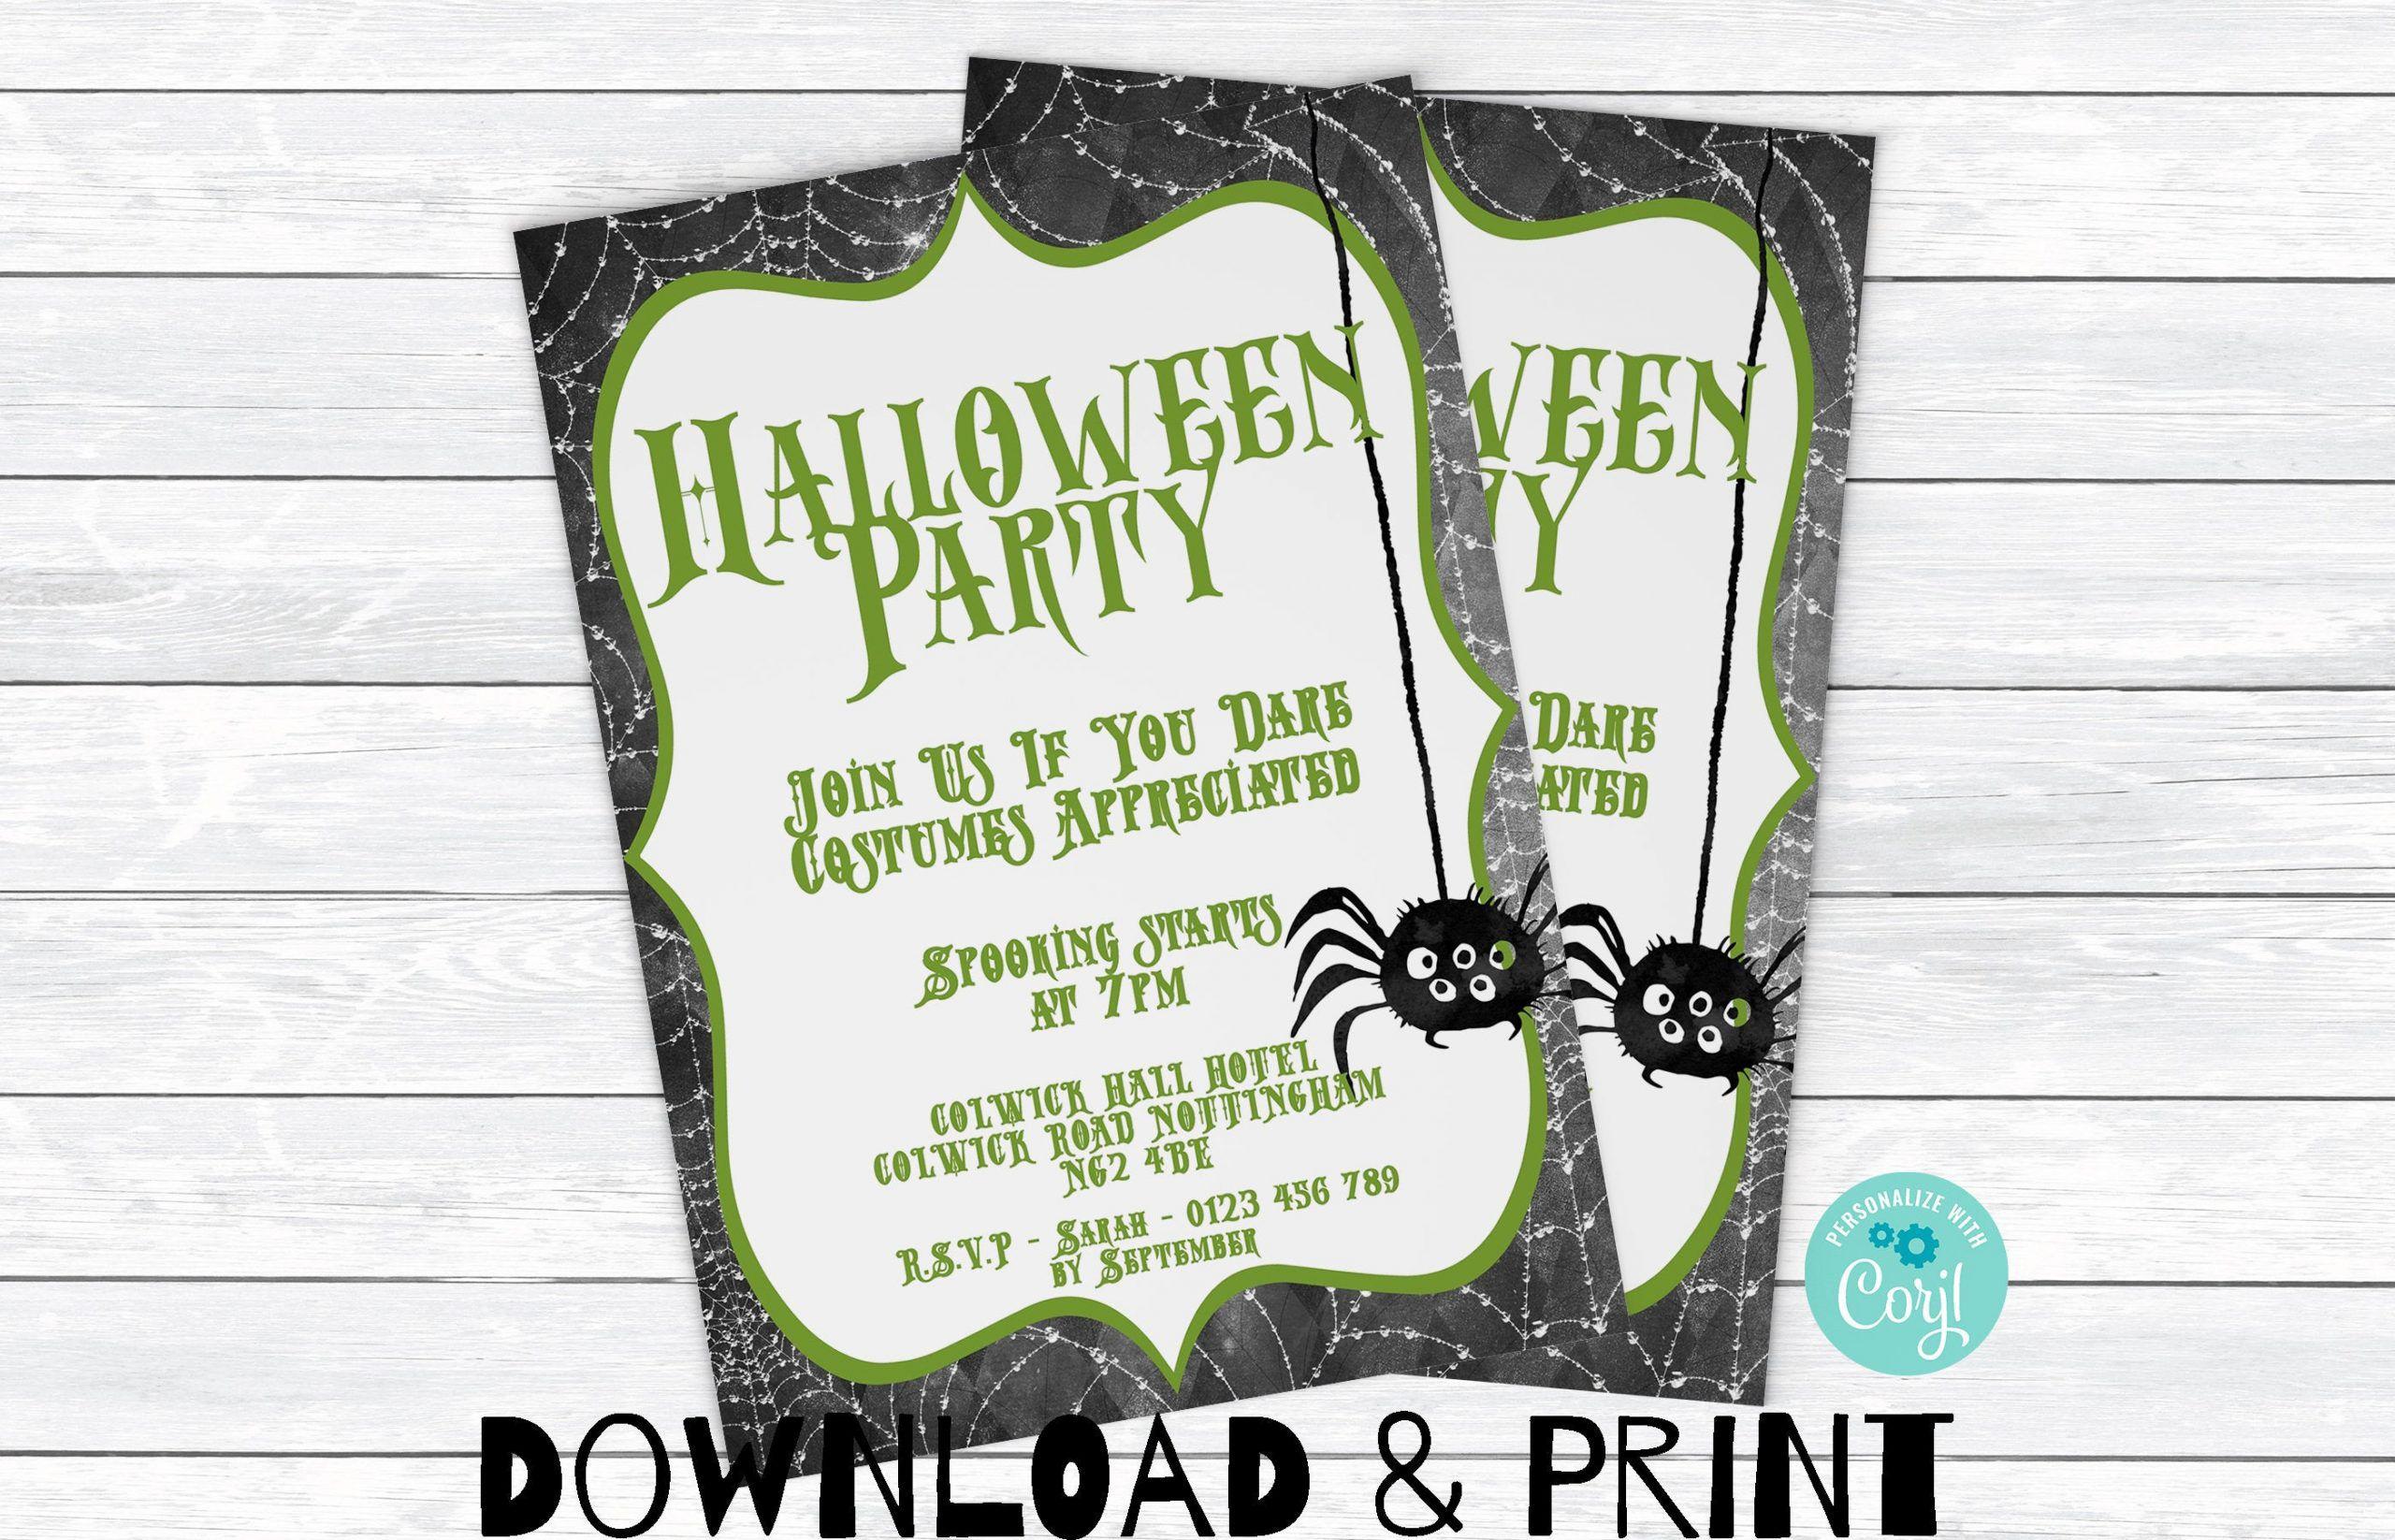 008 Best Halloween Party Invitation Template High Def  Microsoft Block OctoberFull